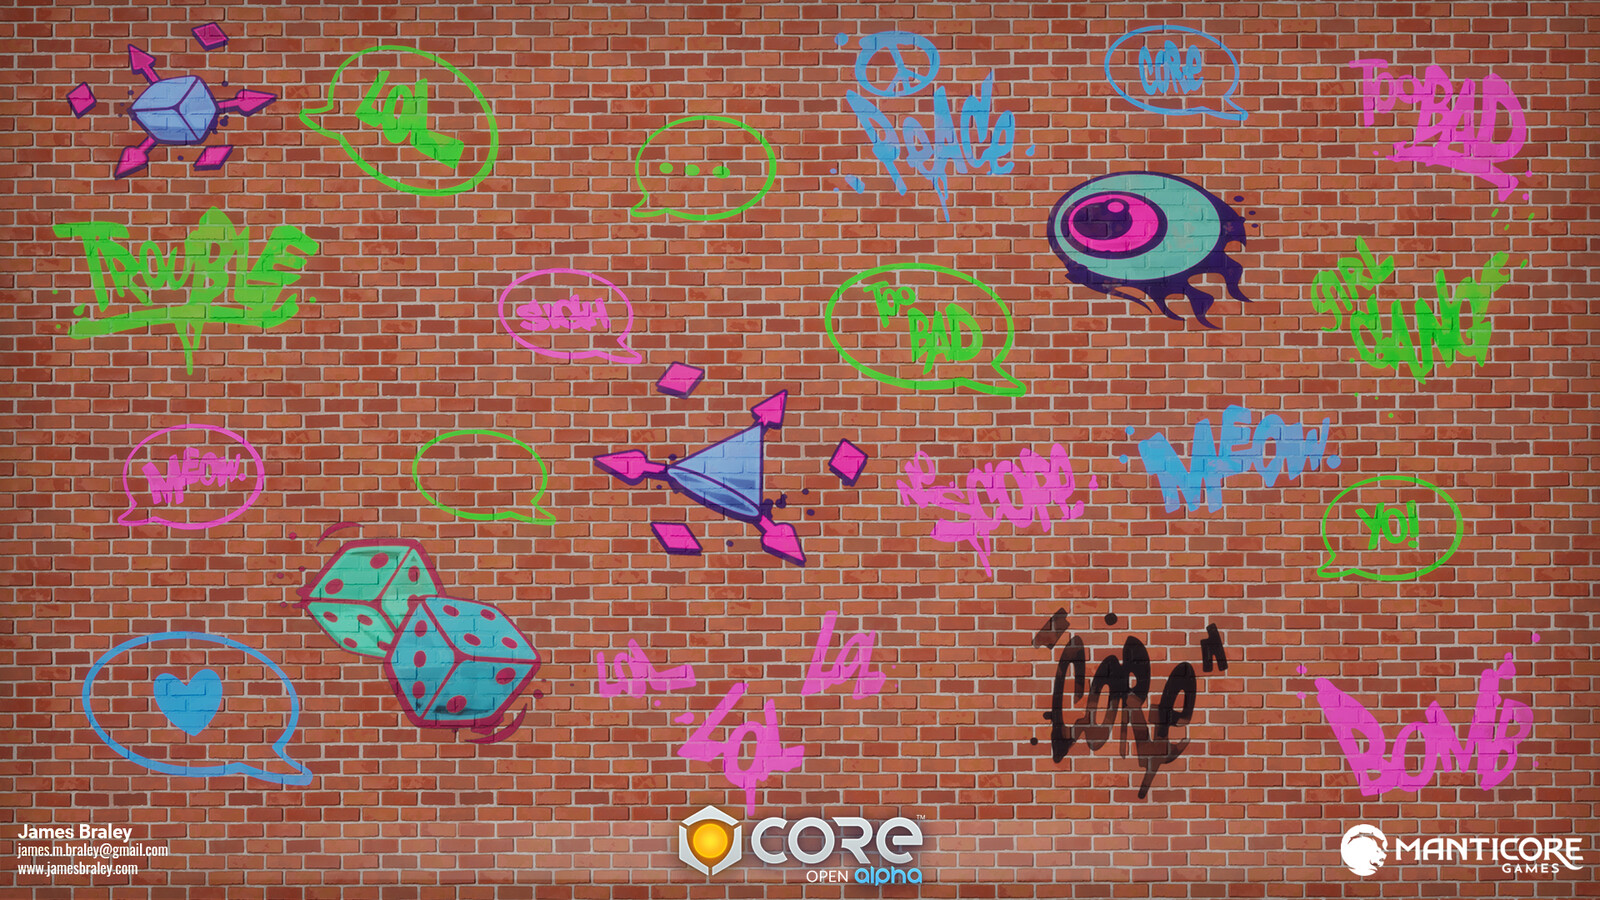 Graffiti Decals (Concepts by Jordan Louie)